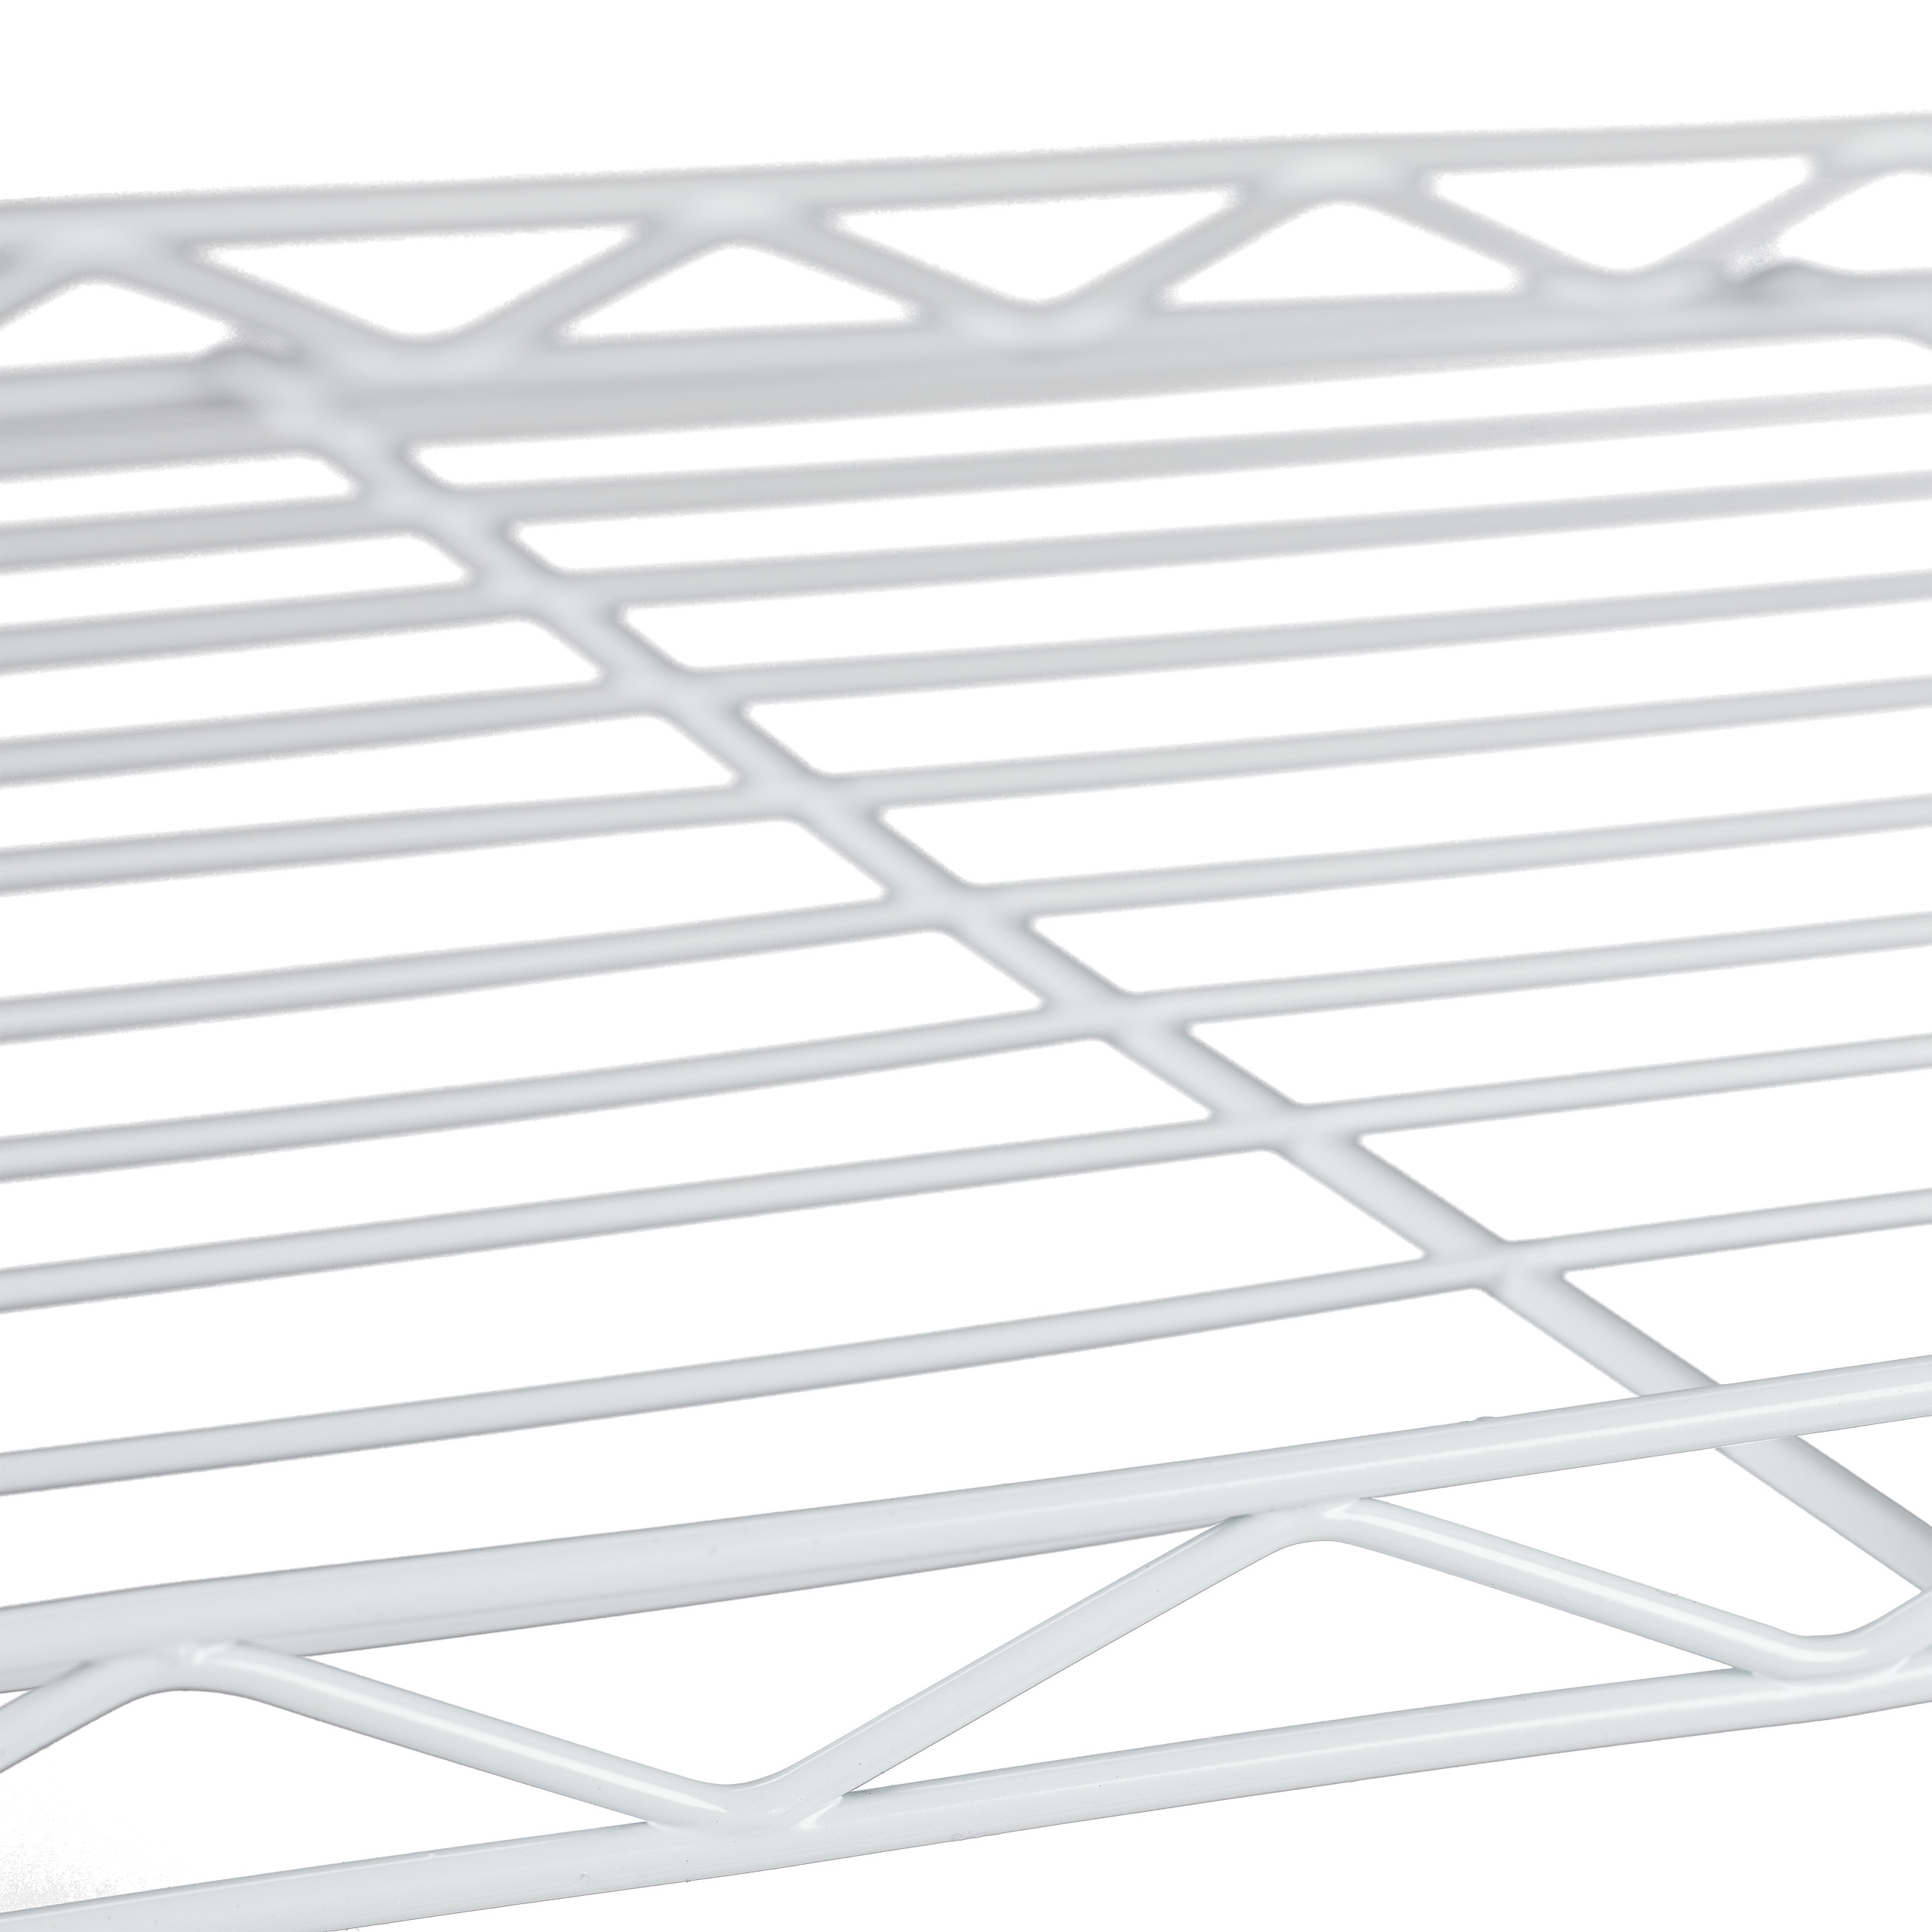 Regal-Metall-Kuechenregal-Metallregal-Kueche-Standregal-Schuhregal-Vorratsregal Indexbild 13